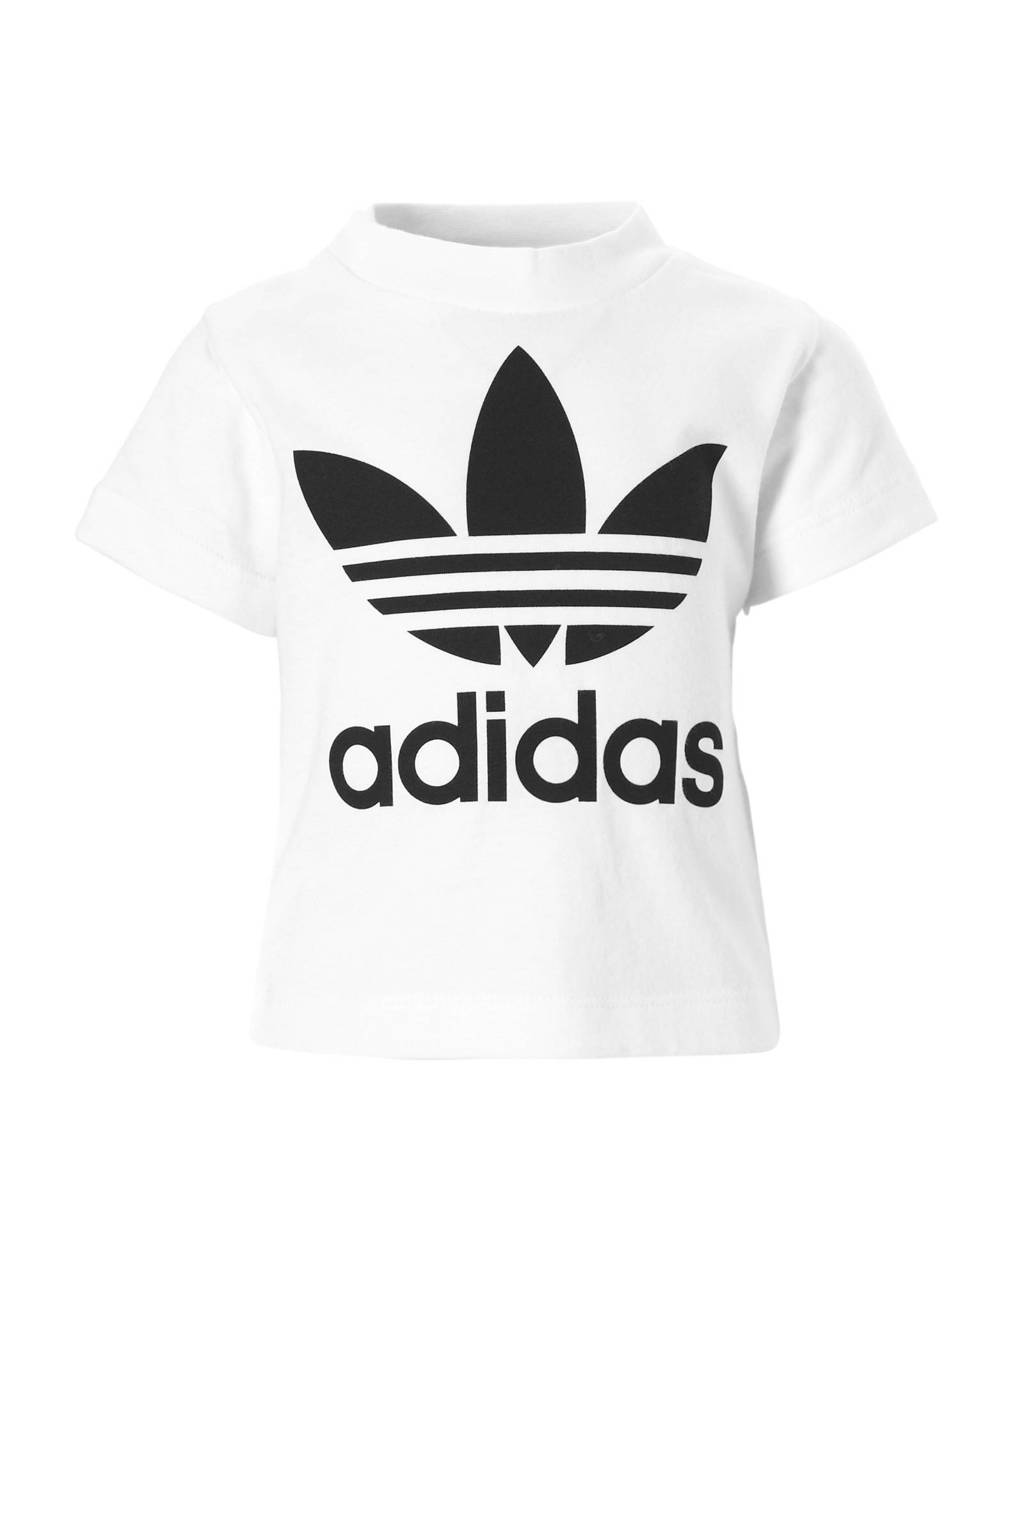 adidas originals Adicolor T-shirt, Wit/zwart